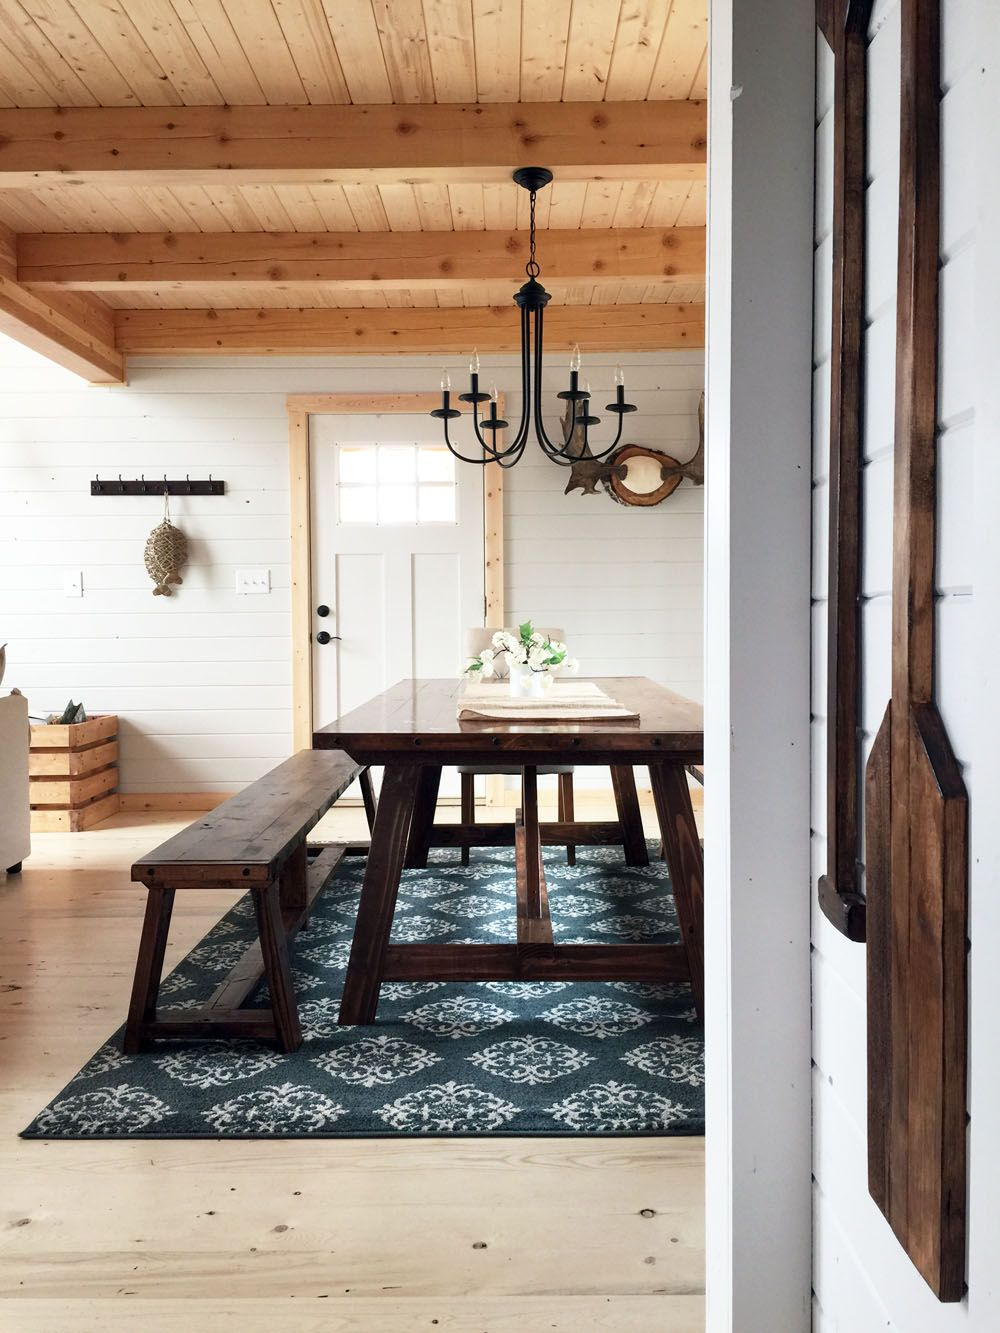 2x4 Truss Table for Alaska Lake Cabin (Ana White